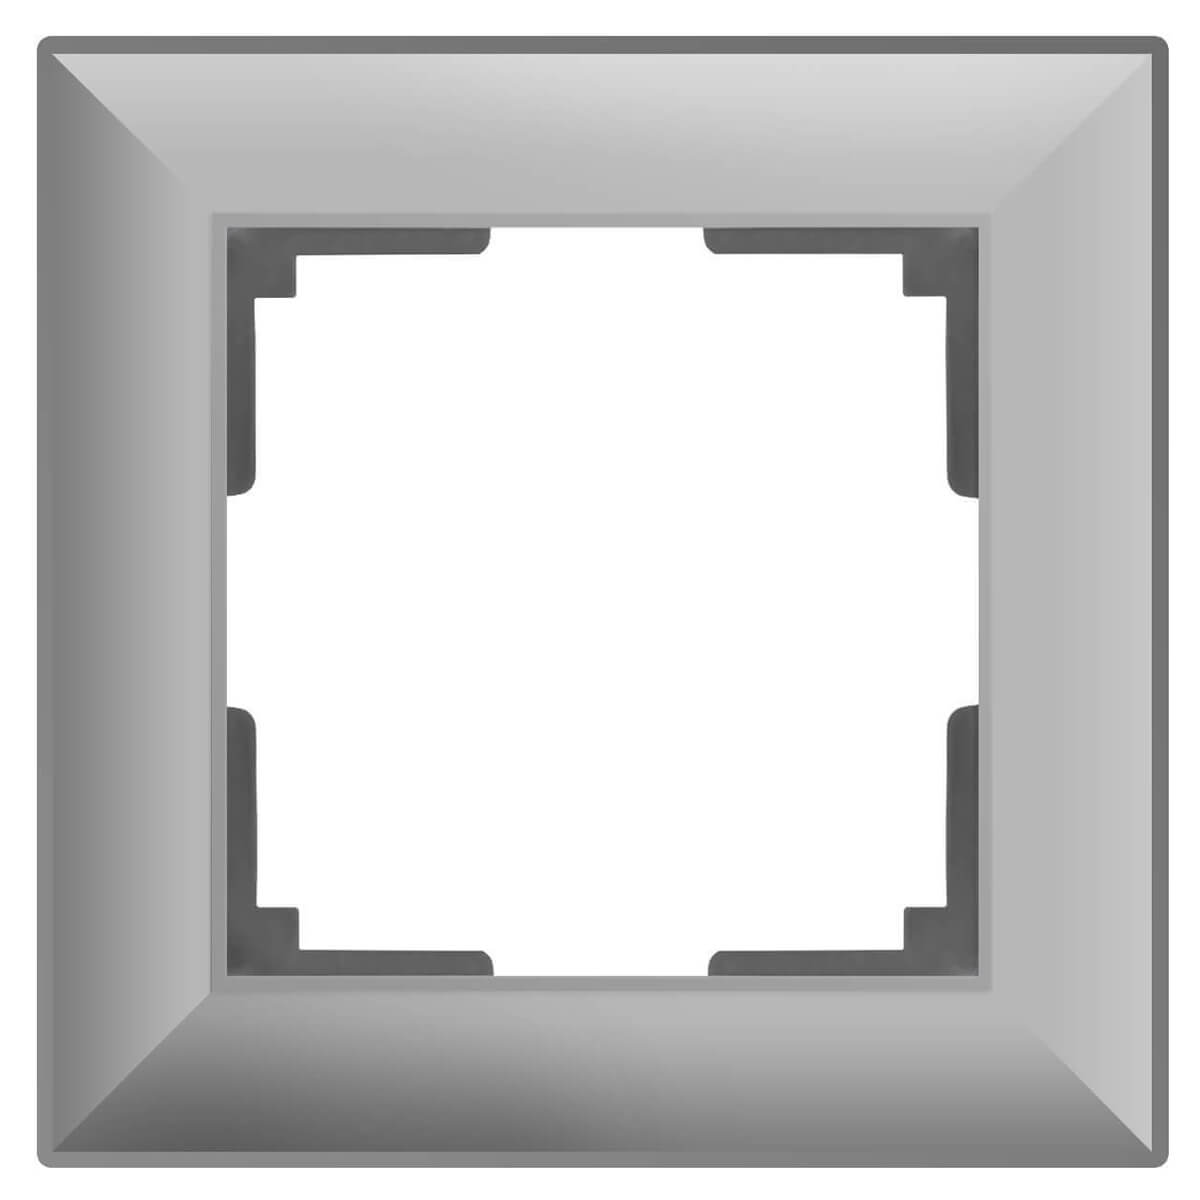 цена Рамка Fiore на 1 пост серебряный WL14-Frame-01 4690389109041 онлайн в 2017 году